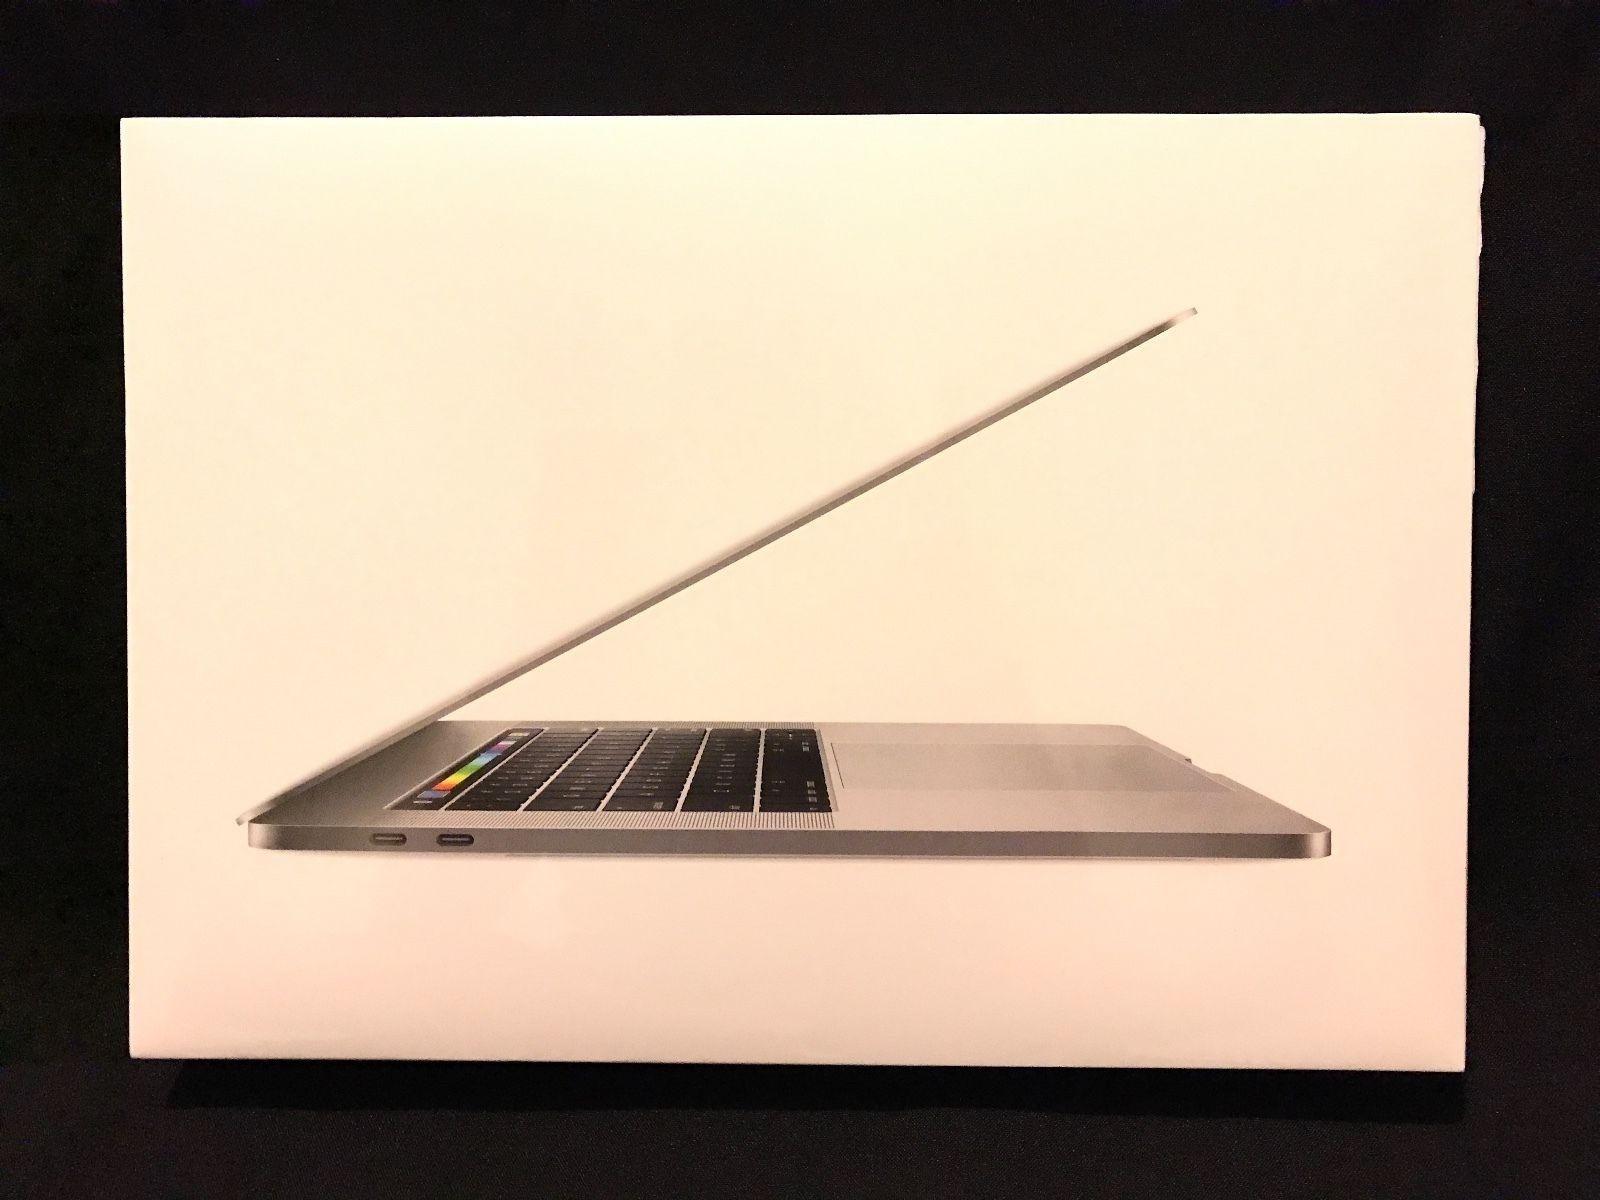 Apple mac Book pro. (2).jpg